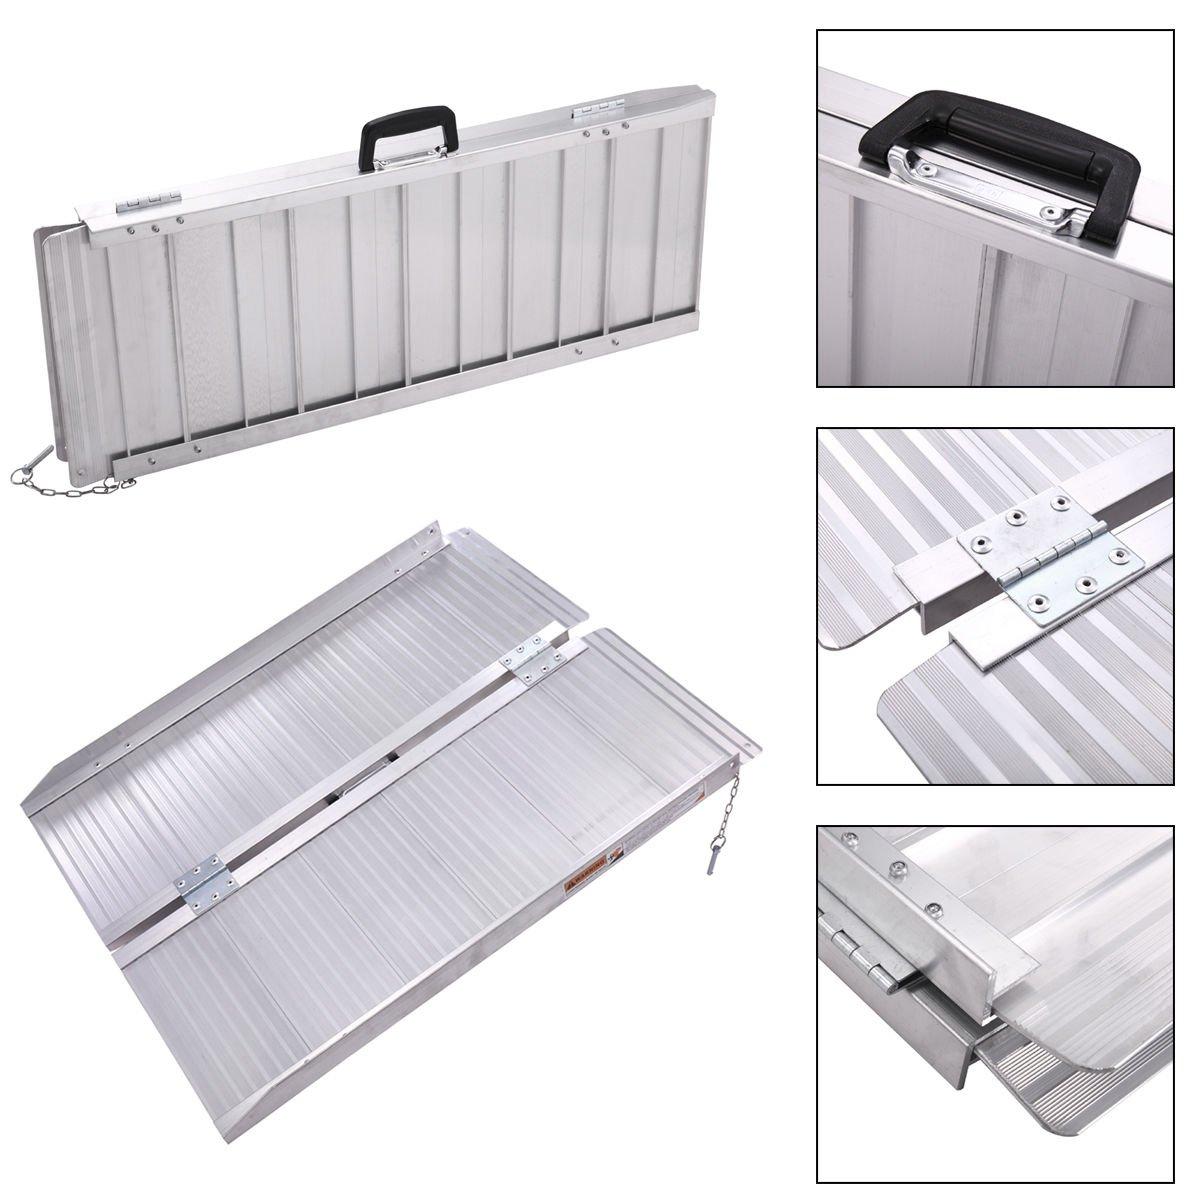 Folding Portable Aluminum Threshold Mobility Wheelchair Ramp w/ Handle